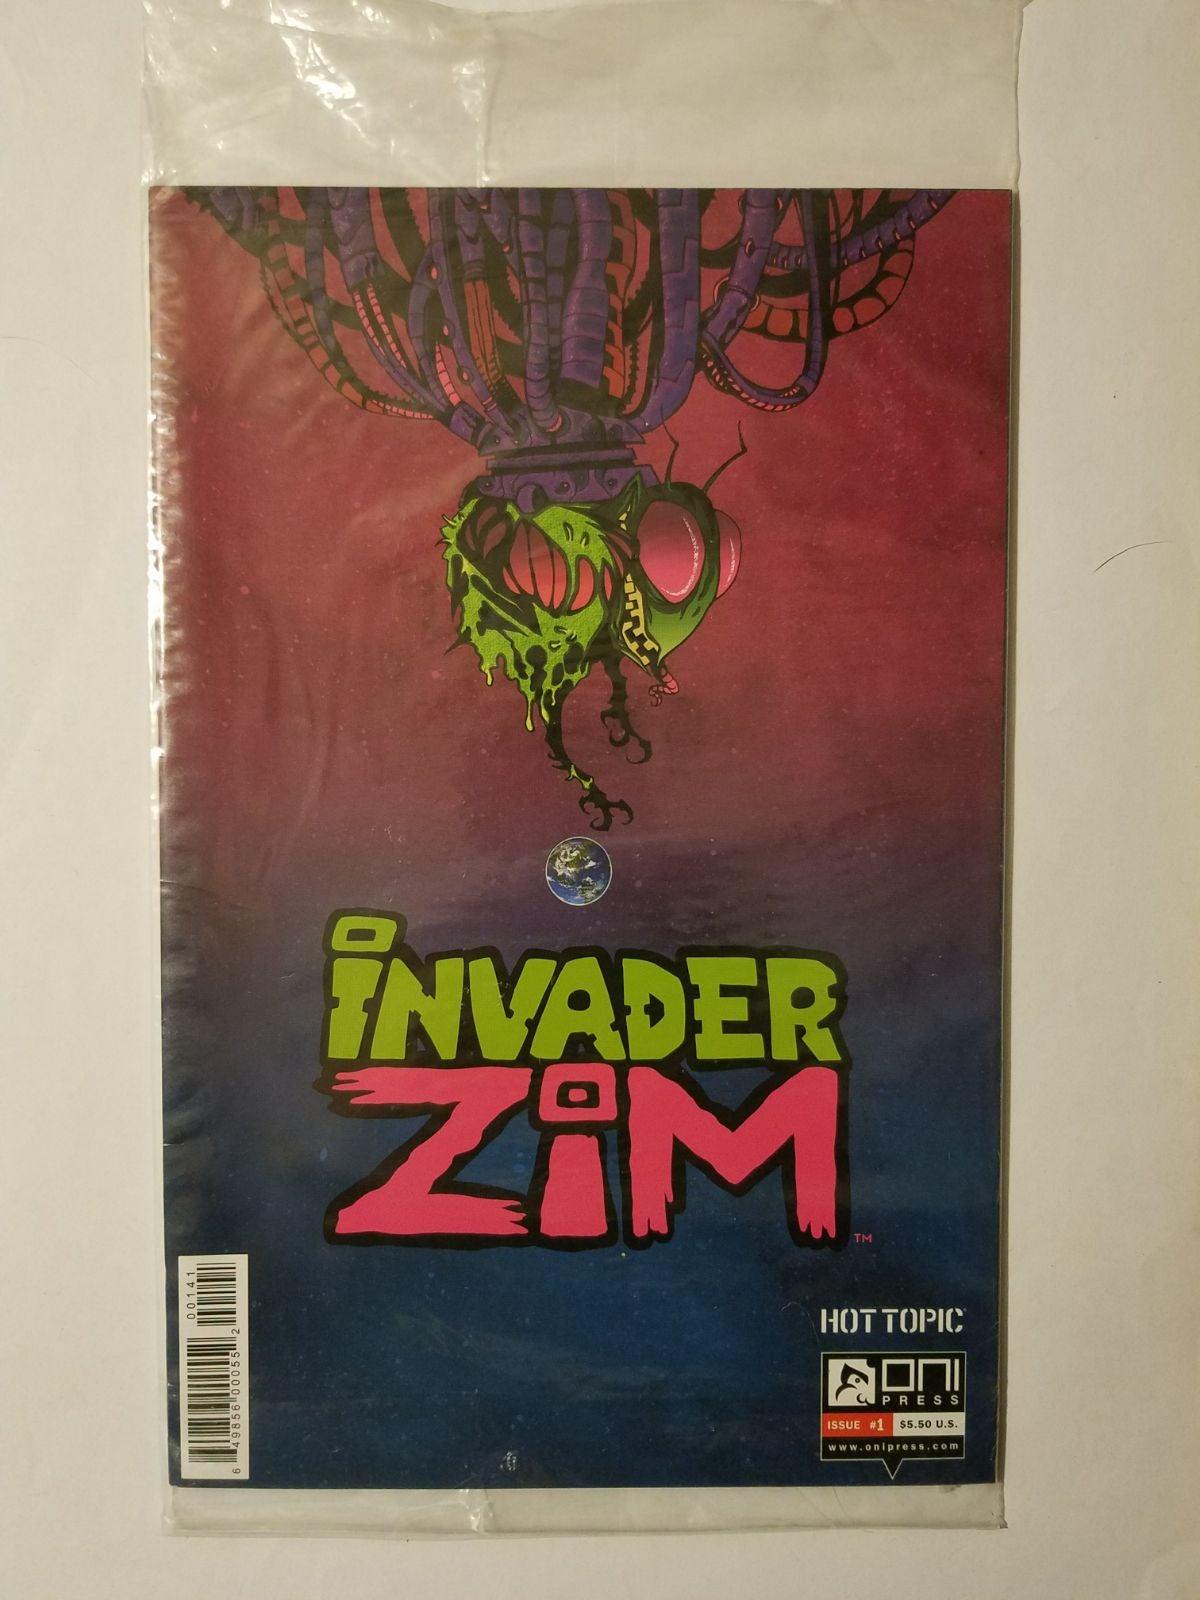 Hot Topic #1 Invader Zim sealed variant